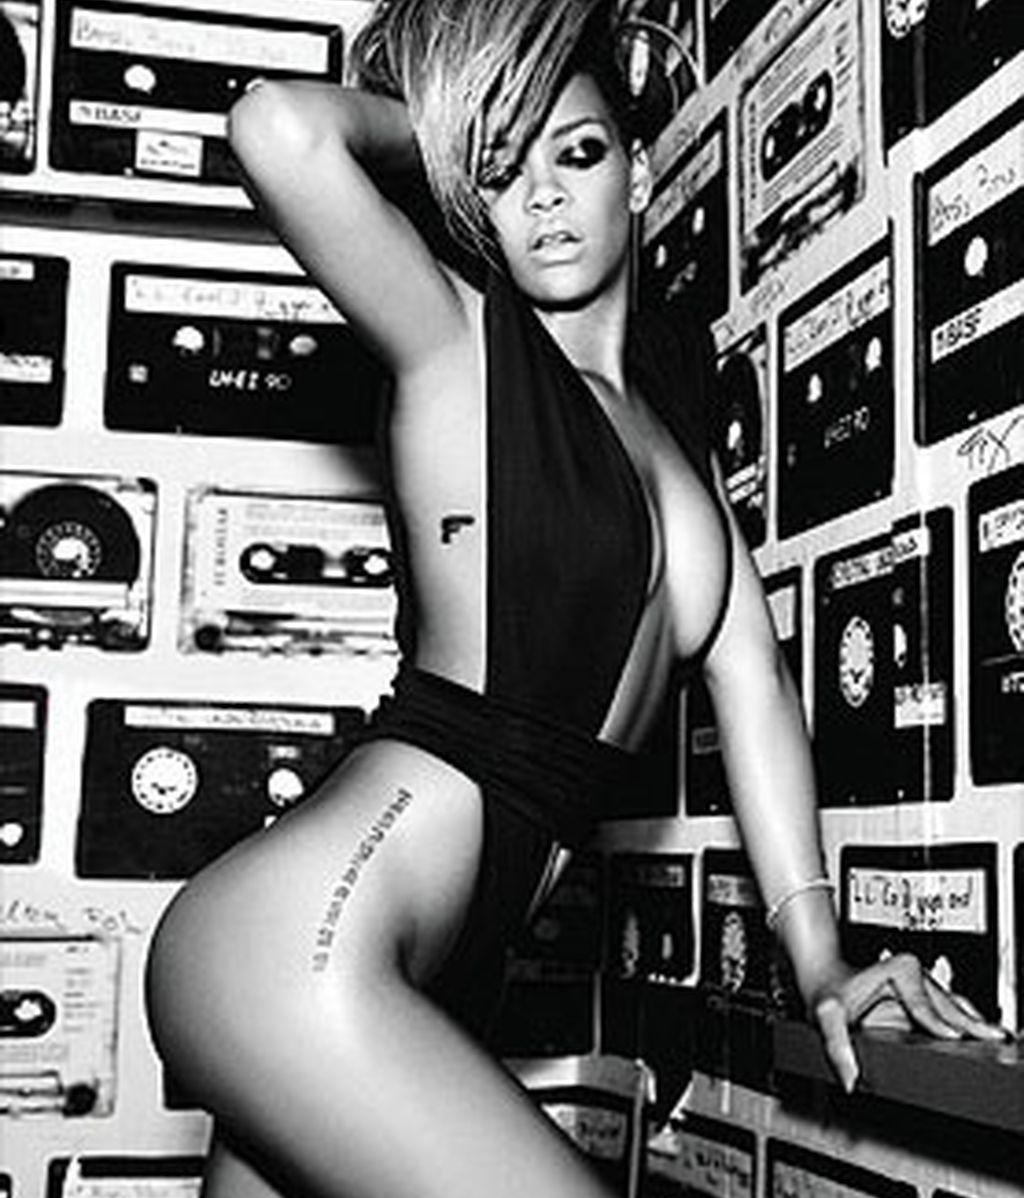 Rihanna cree que todas las mujeres deben fotografiarse desnudas. Foto: The Sun